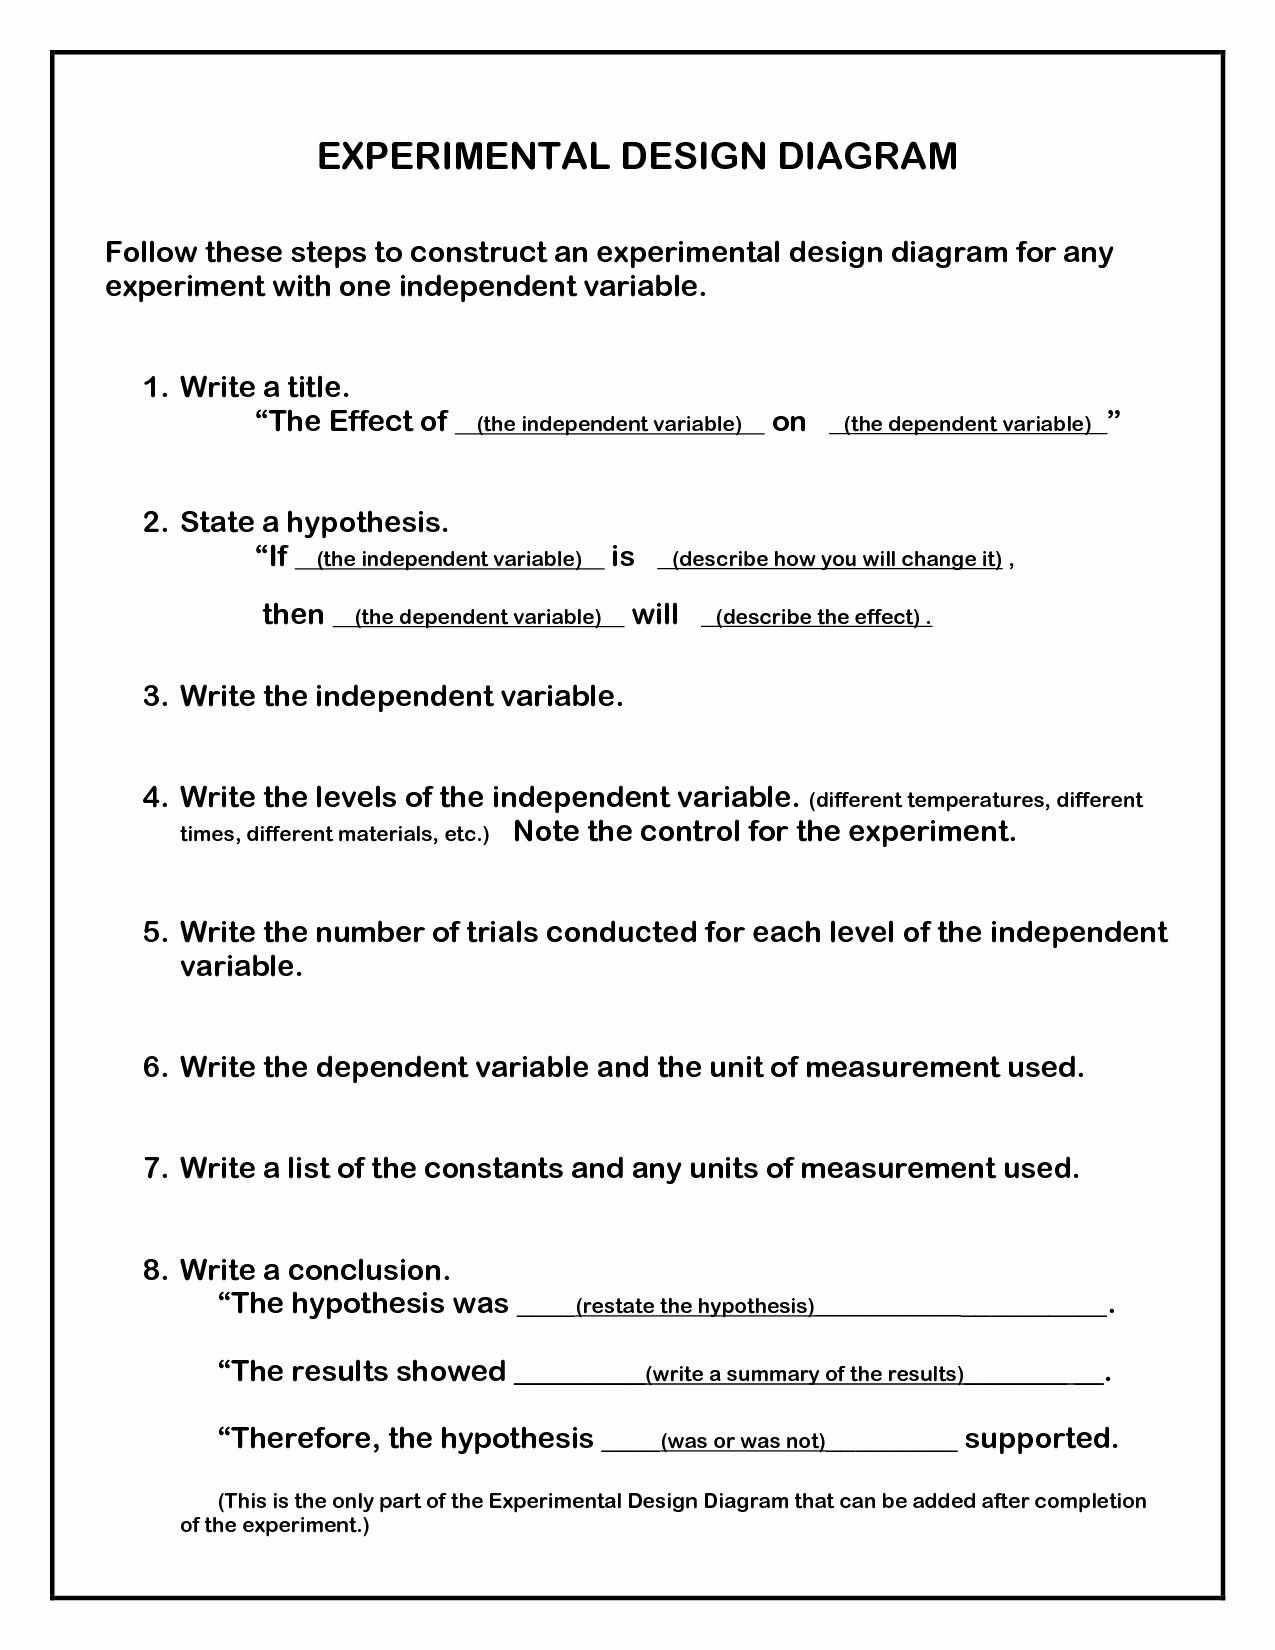 50 Experimental Design Worksheet Answers